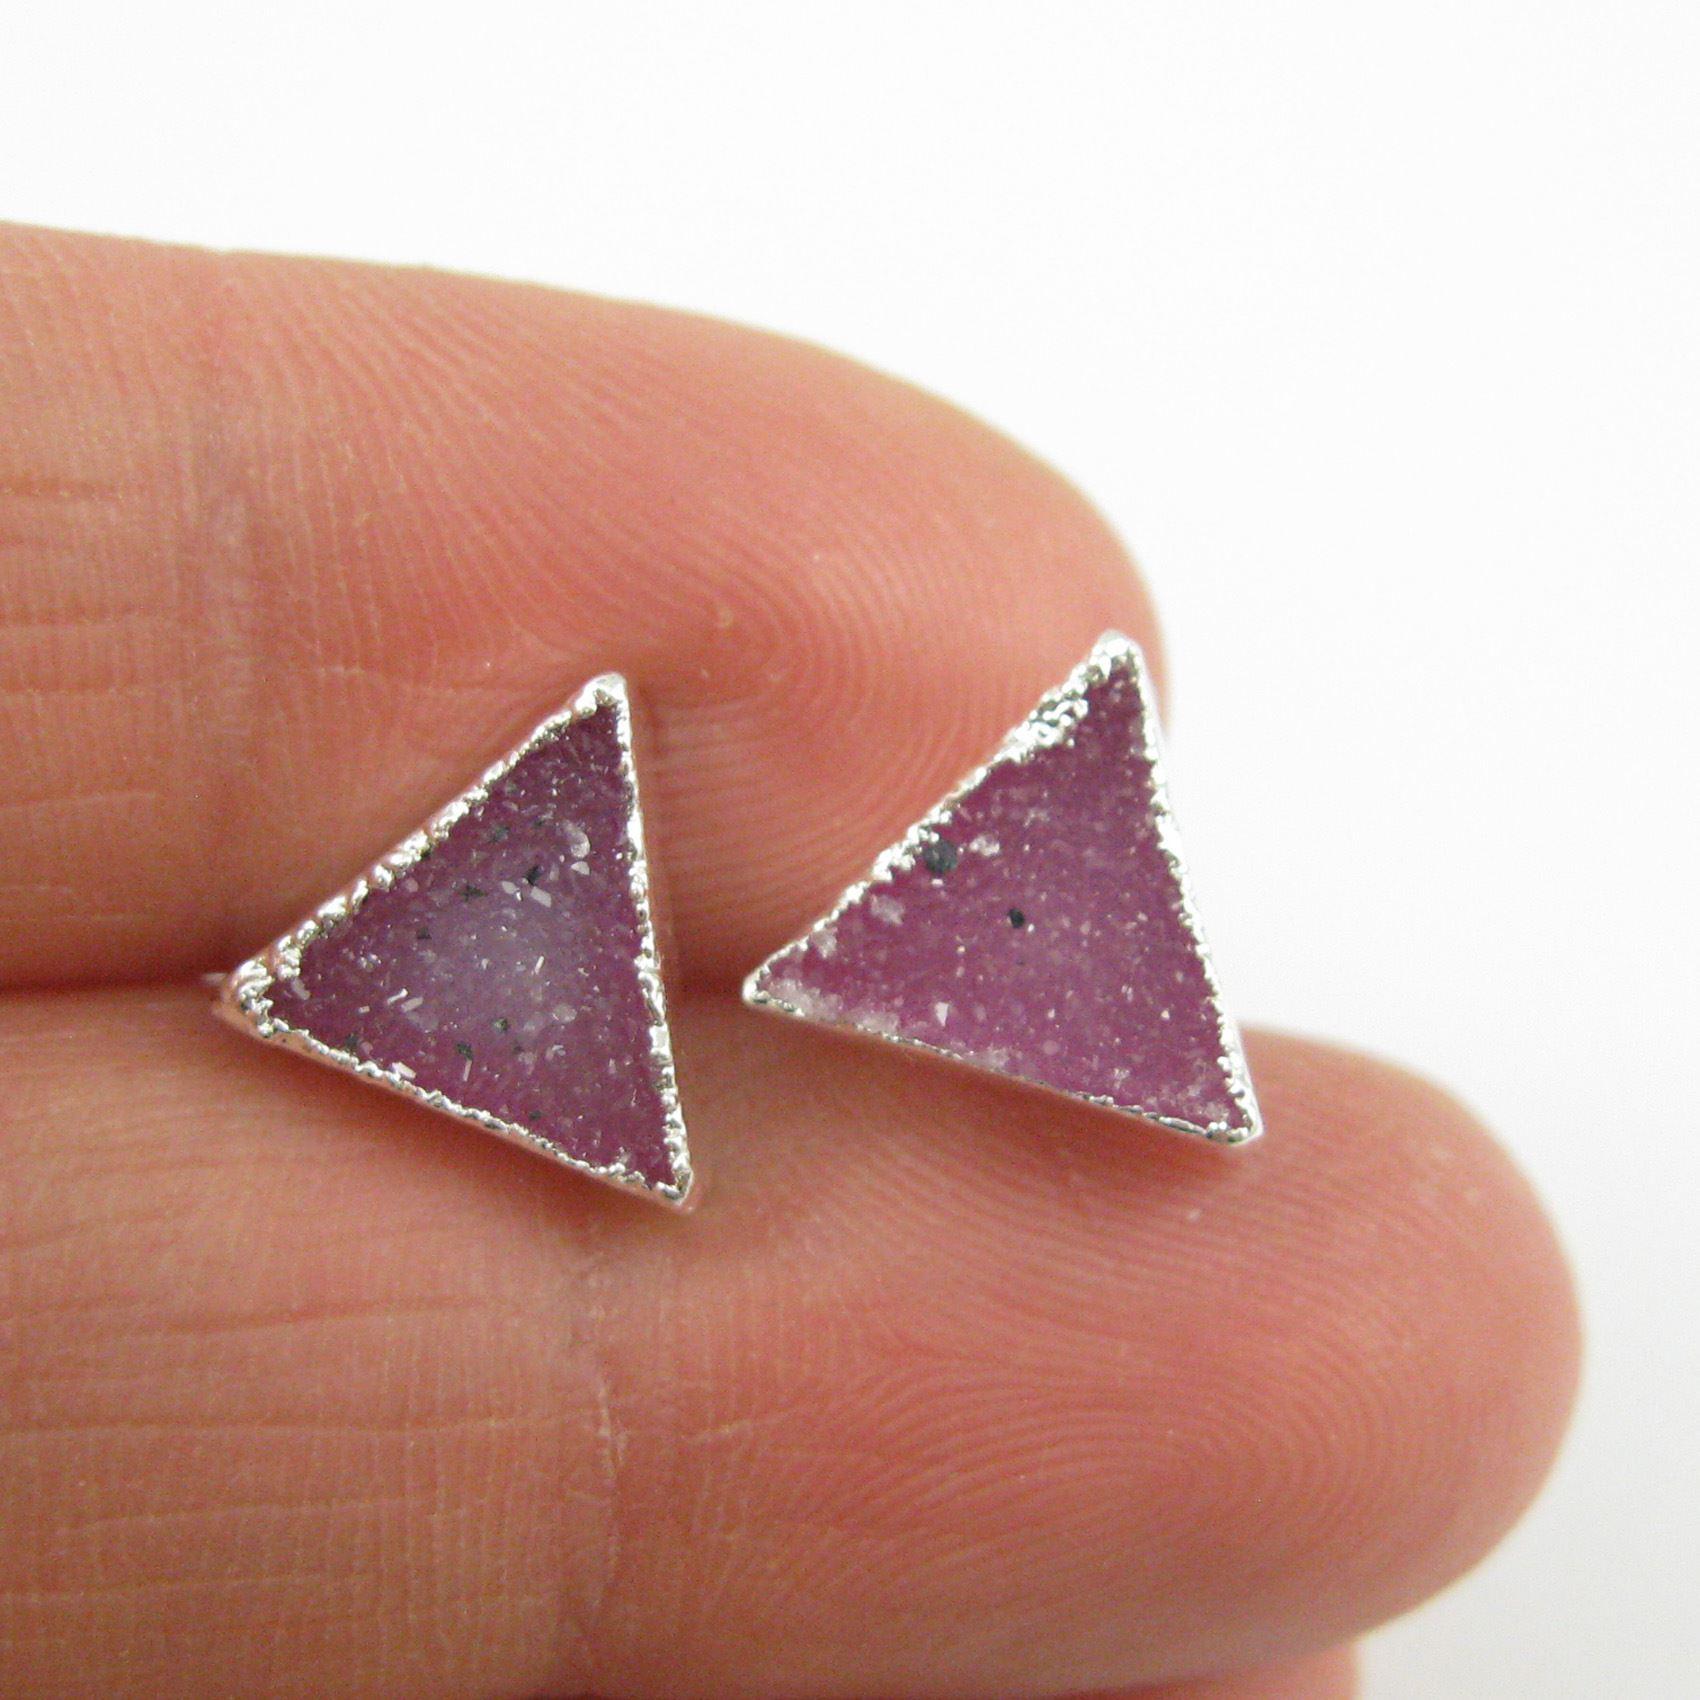 Druzy Earring Studs, Pink Druzy Agate,Gemstone Stud Earrings - Sterling Silver- Triangle 10mm - 1 Pair